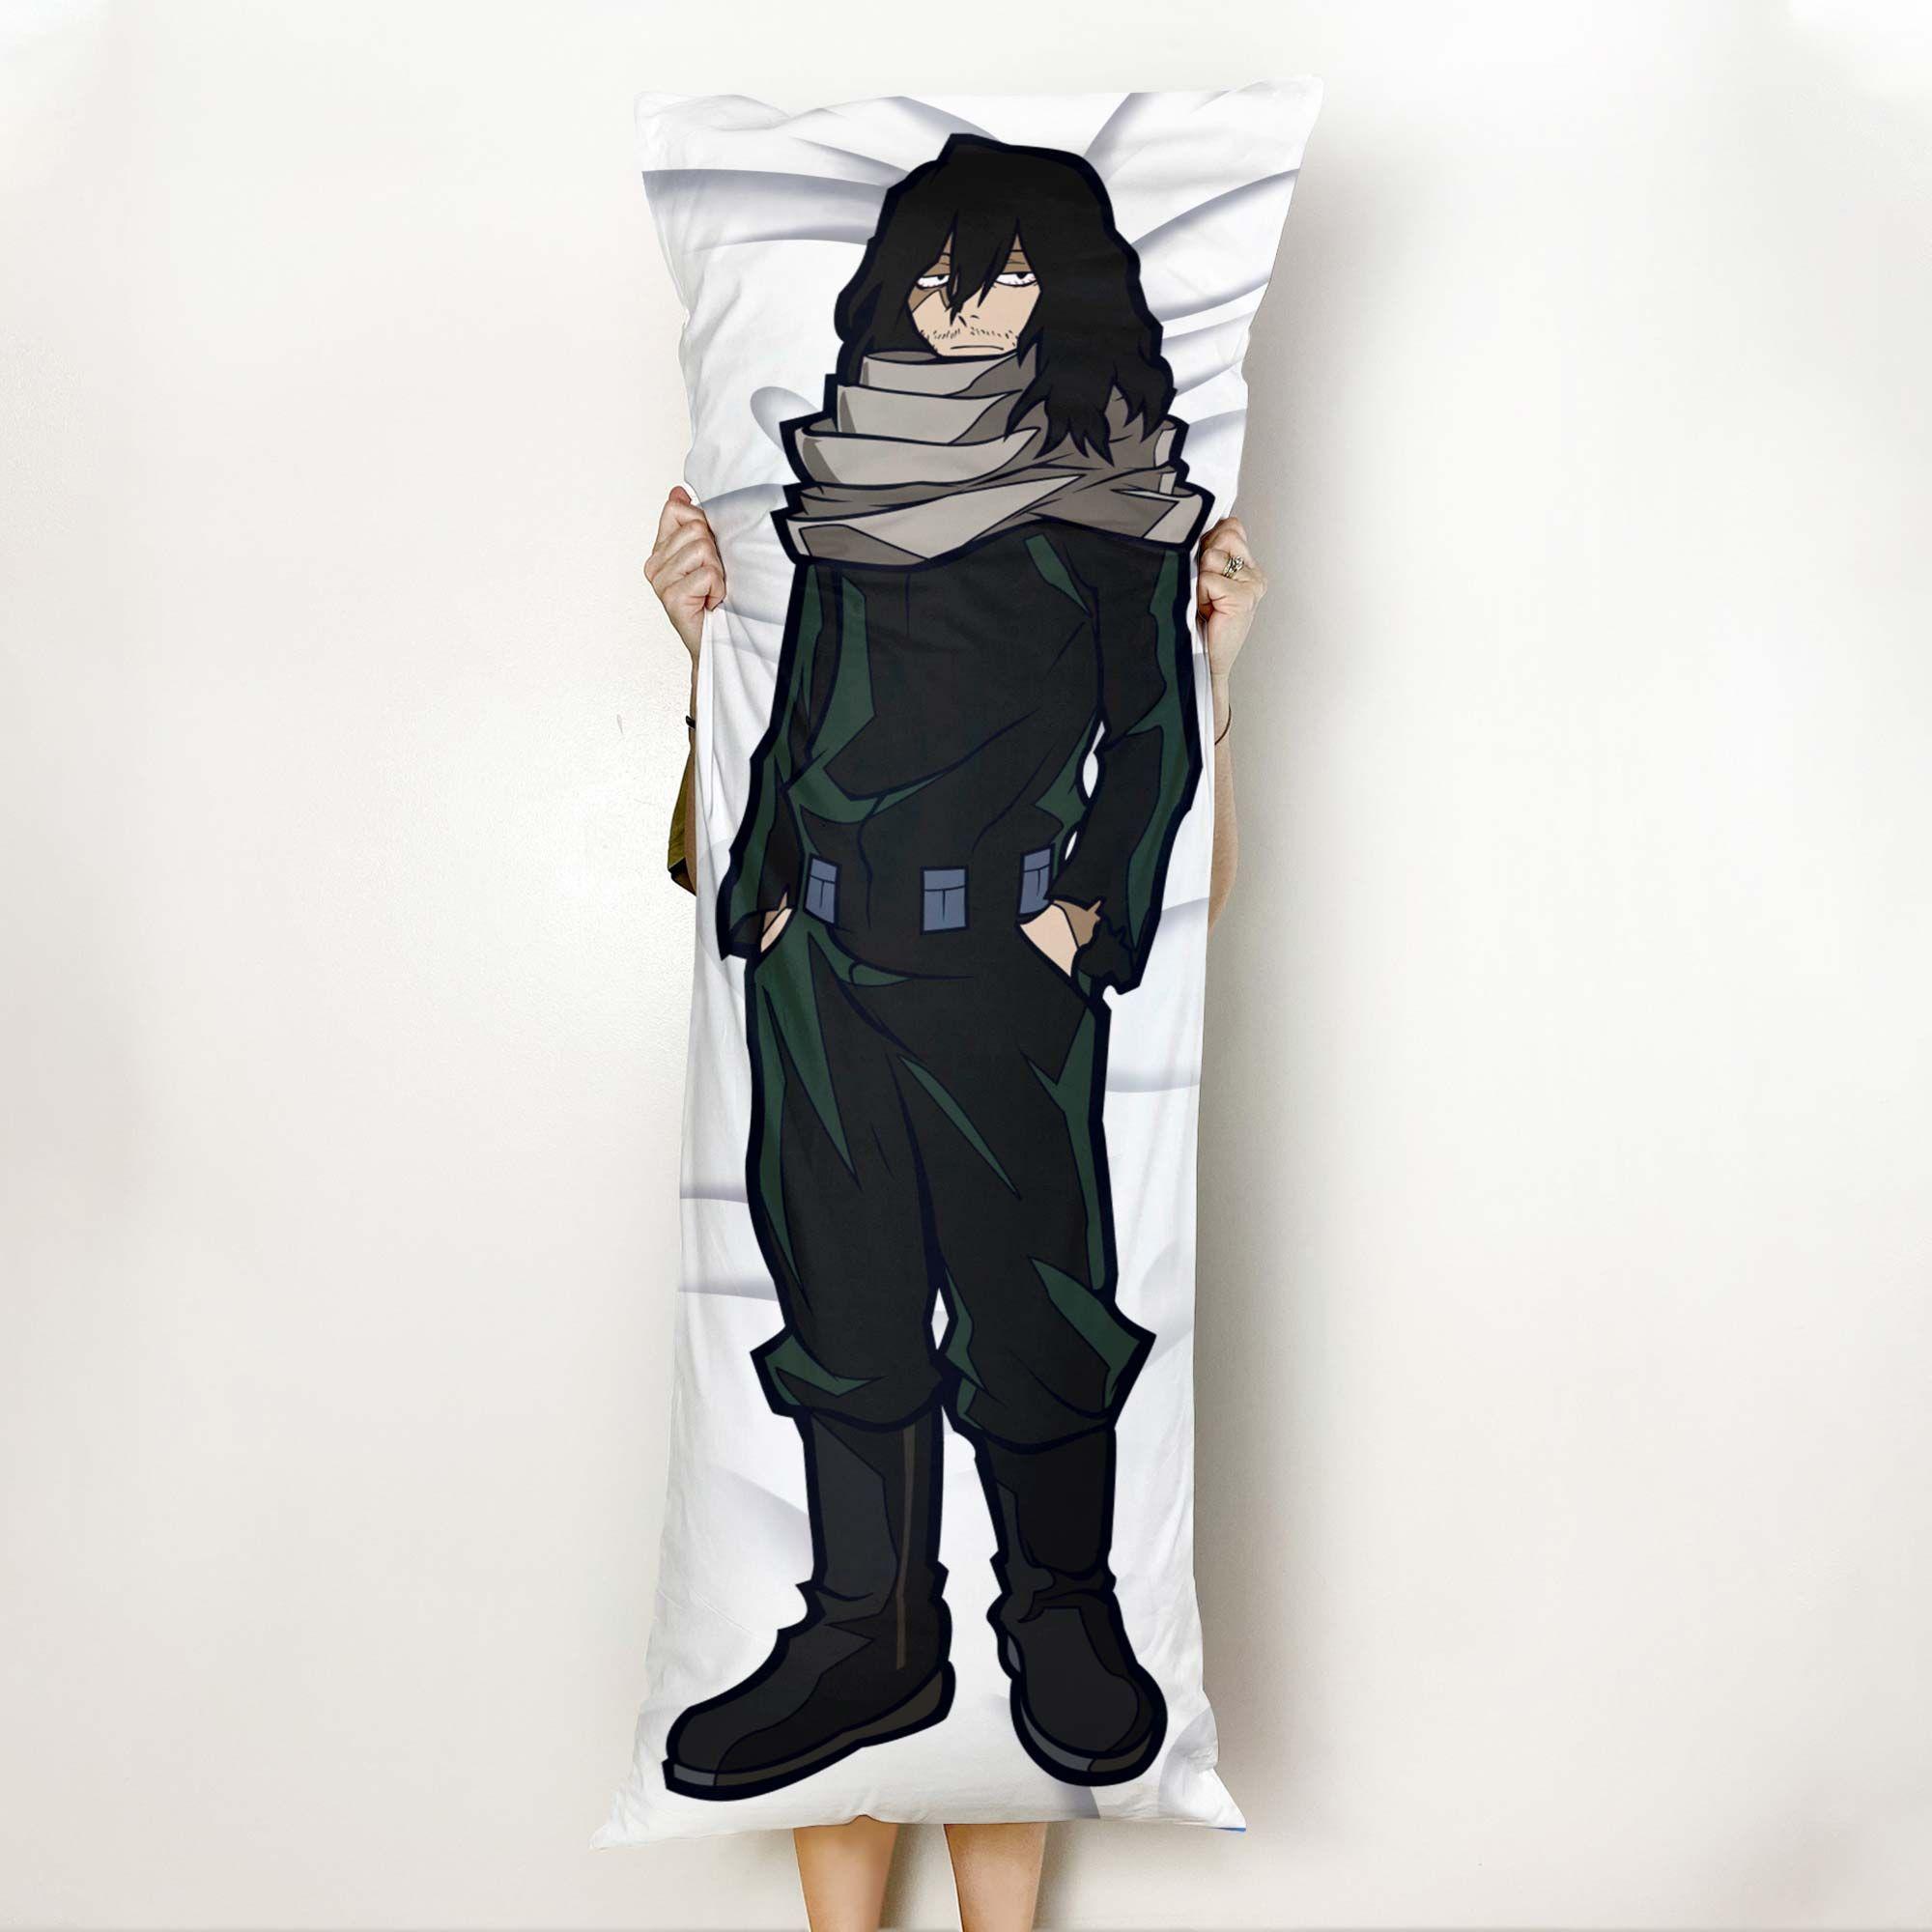 Shouta Aizawa Body Pillow Cover Custom My Hero Academia Anime Gifts Official Merch GO0110